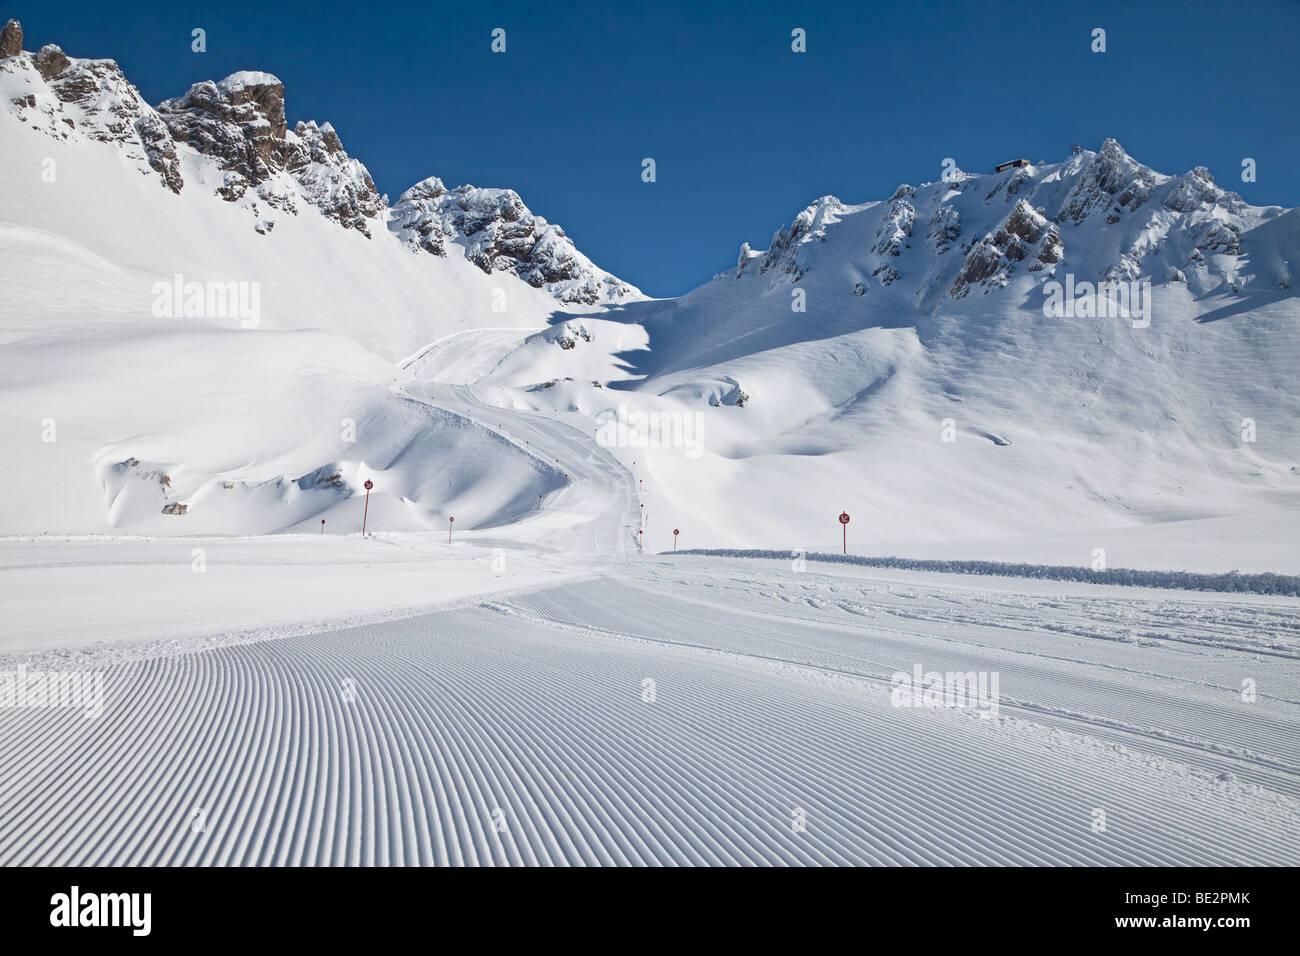 Europa Austria, Tirolo. St. Anton am Arlberg, recentemente curate piste Immagini Stock